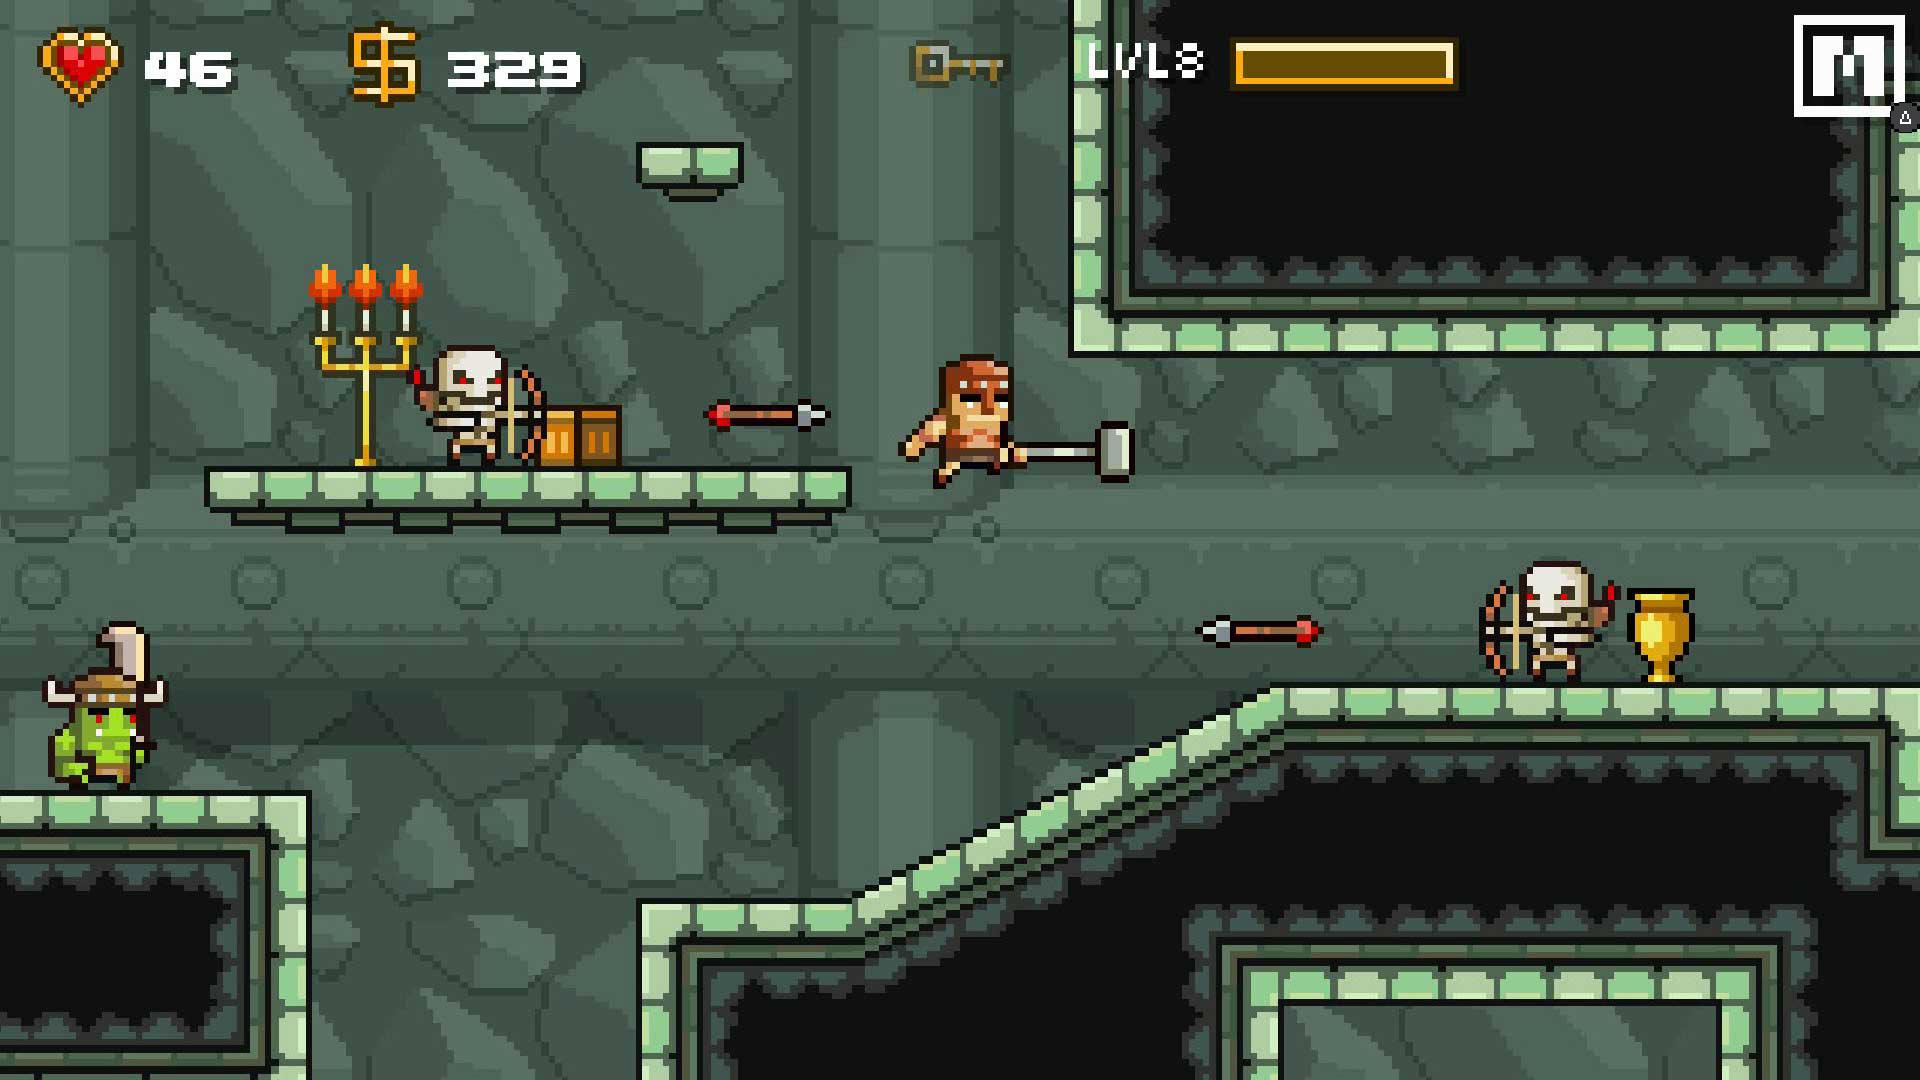 Devious Dungeon Screenshot 3